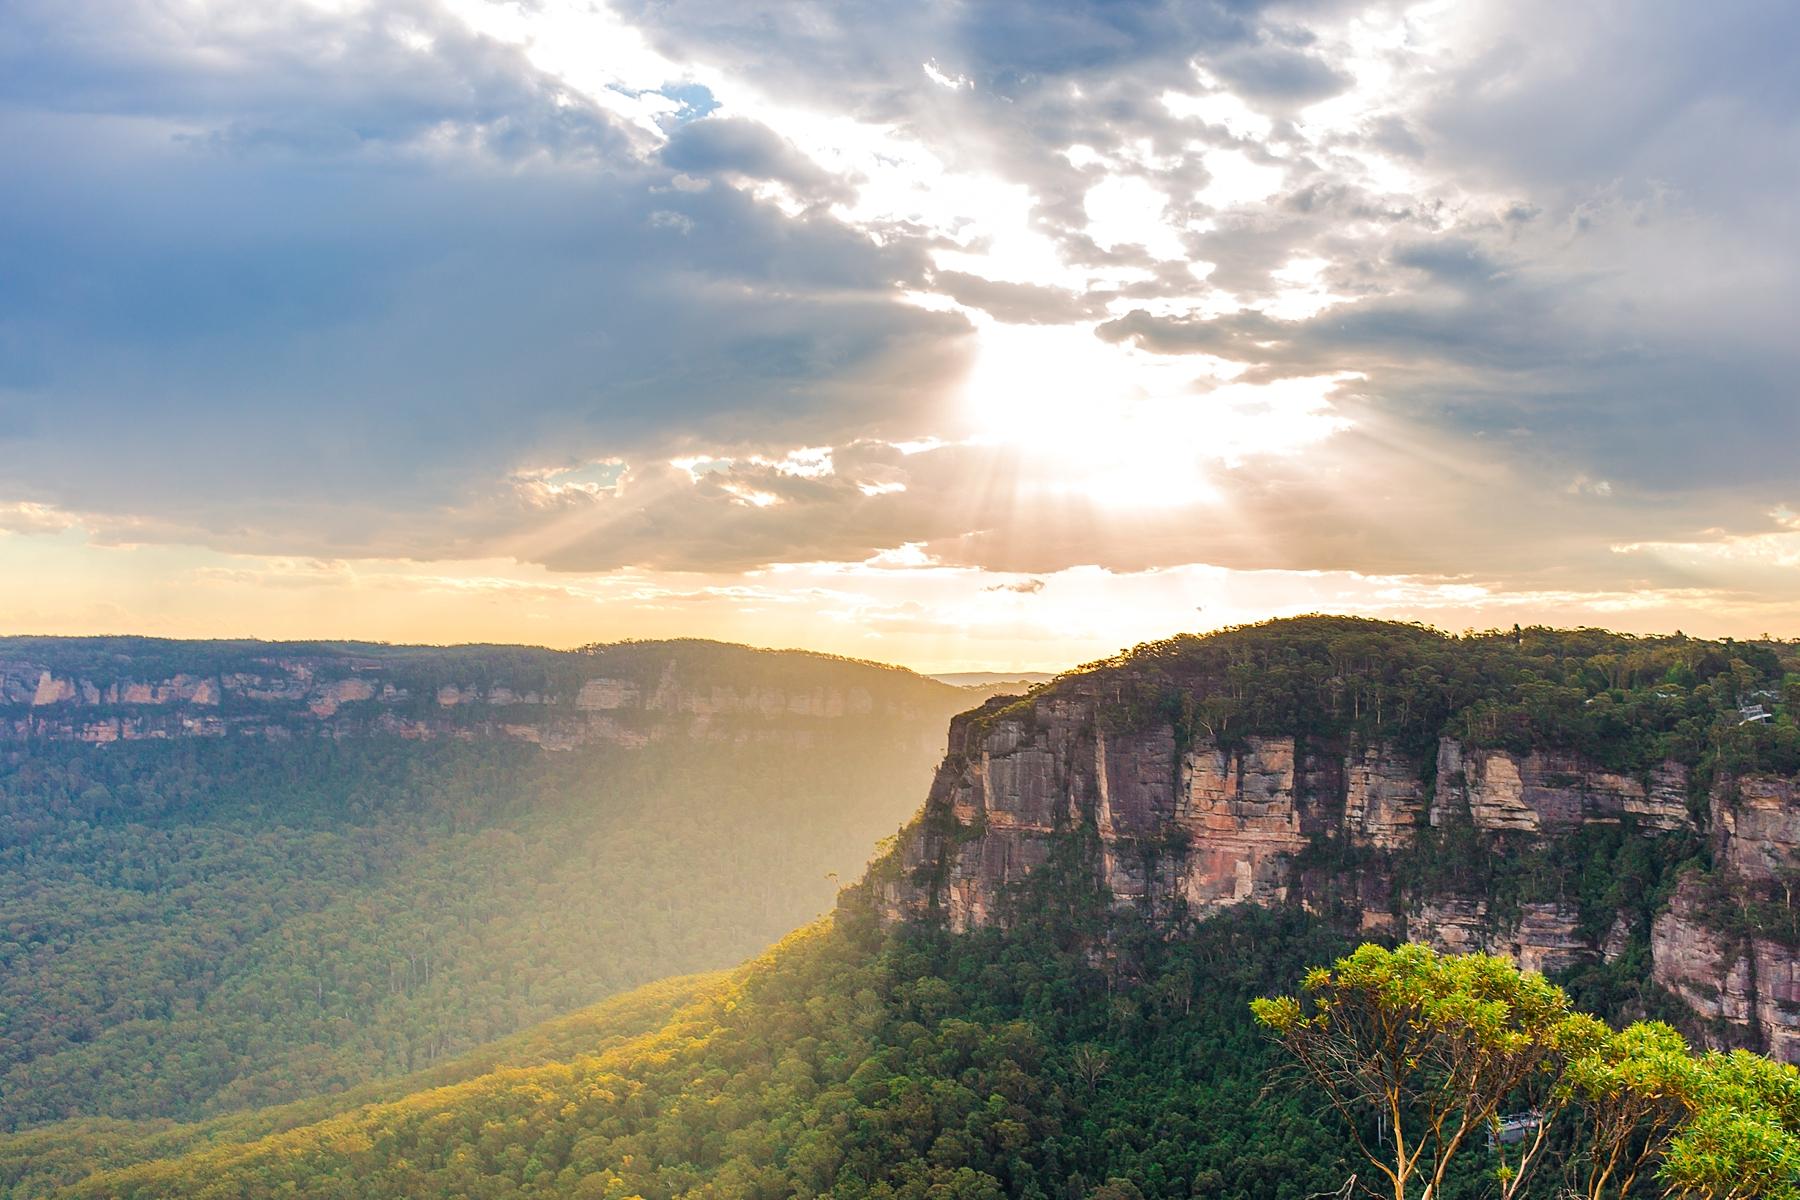 blue-mountains-australia-scenery_0130.jpg